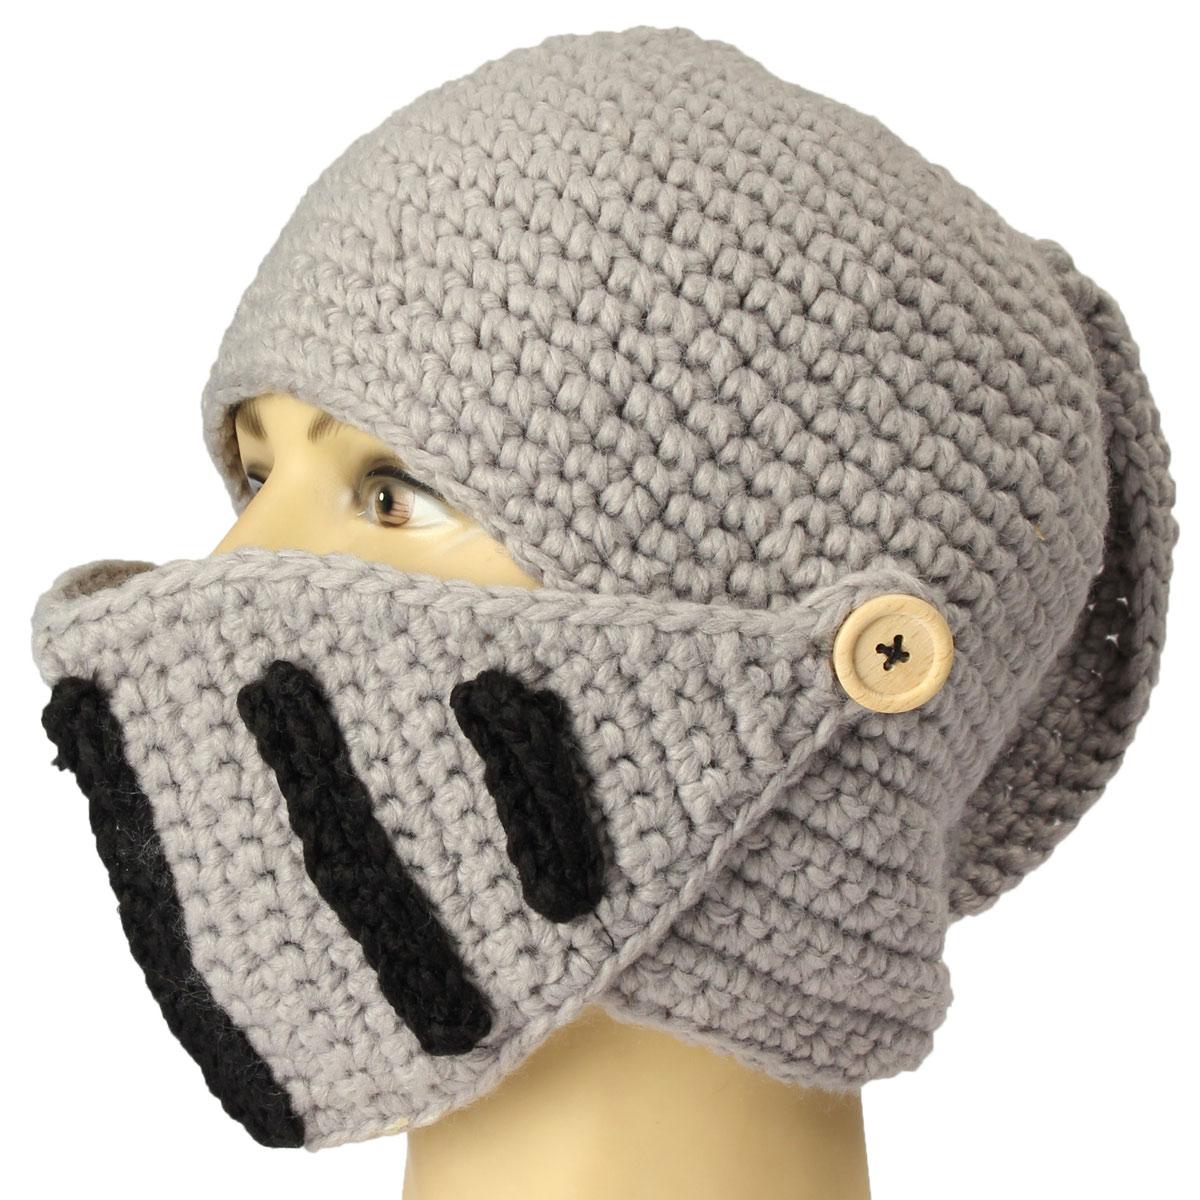 Unisex Men Knit Face Mask Beard Cap Crochet Ski Mustache Winter Warm Beanie  Hat  d9a701c864d